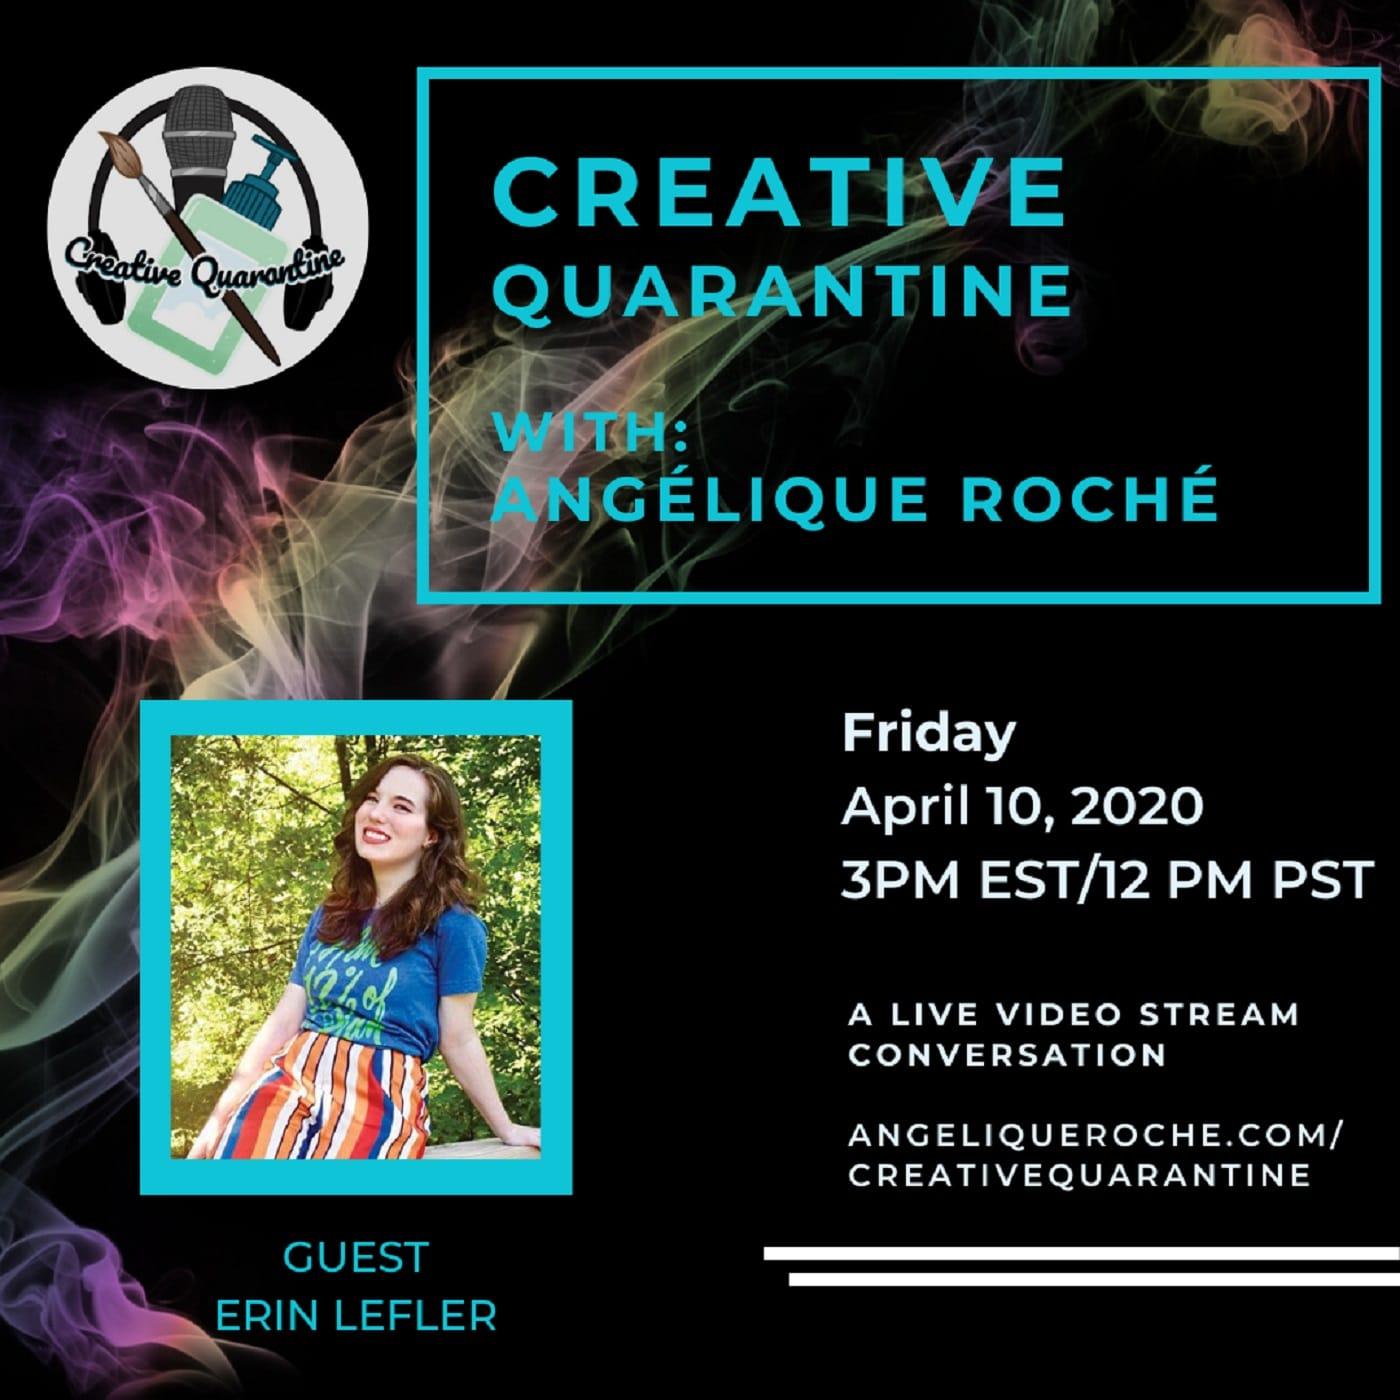 Creative Quarantine - Episode 15: Artist, Erin Lefler